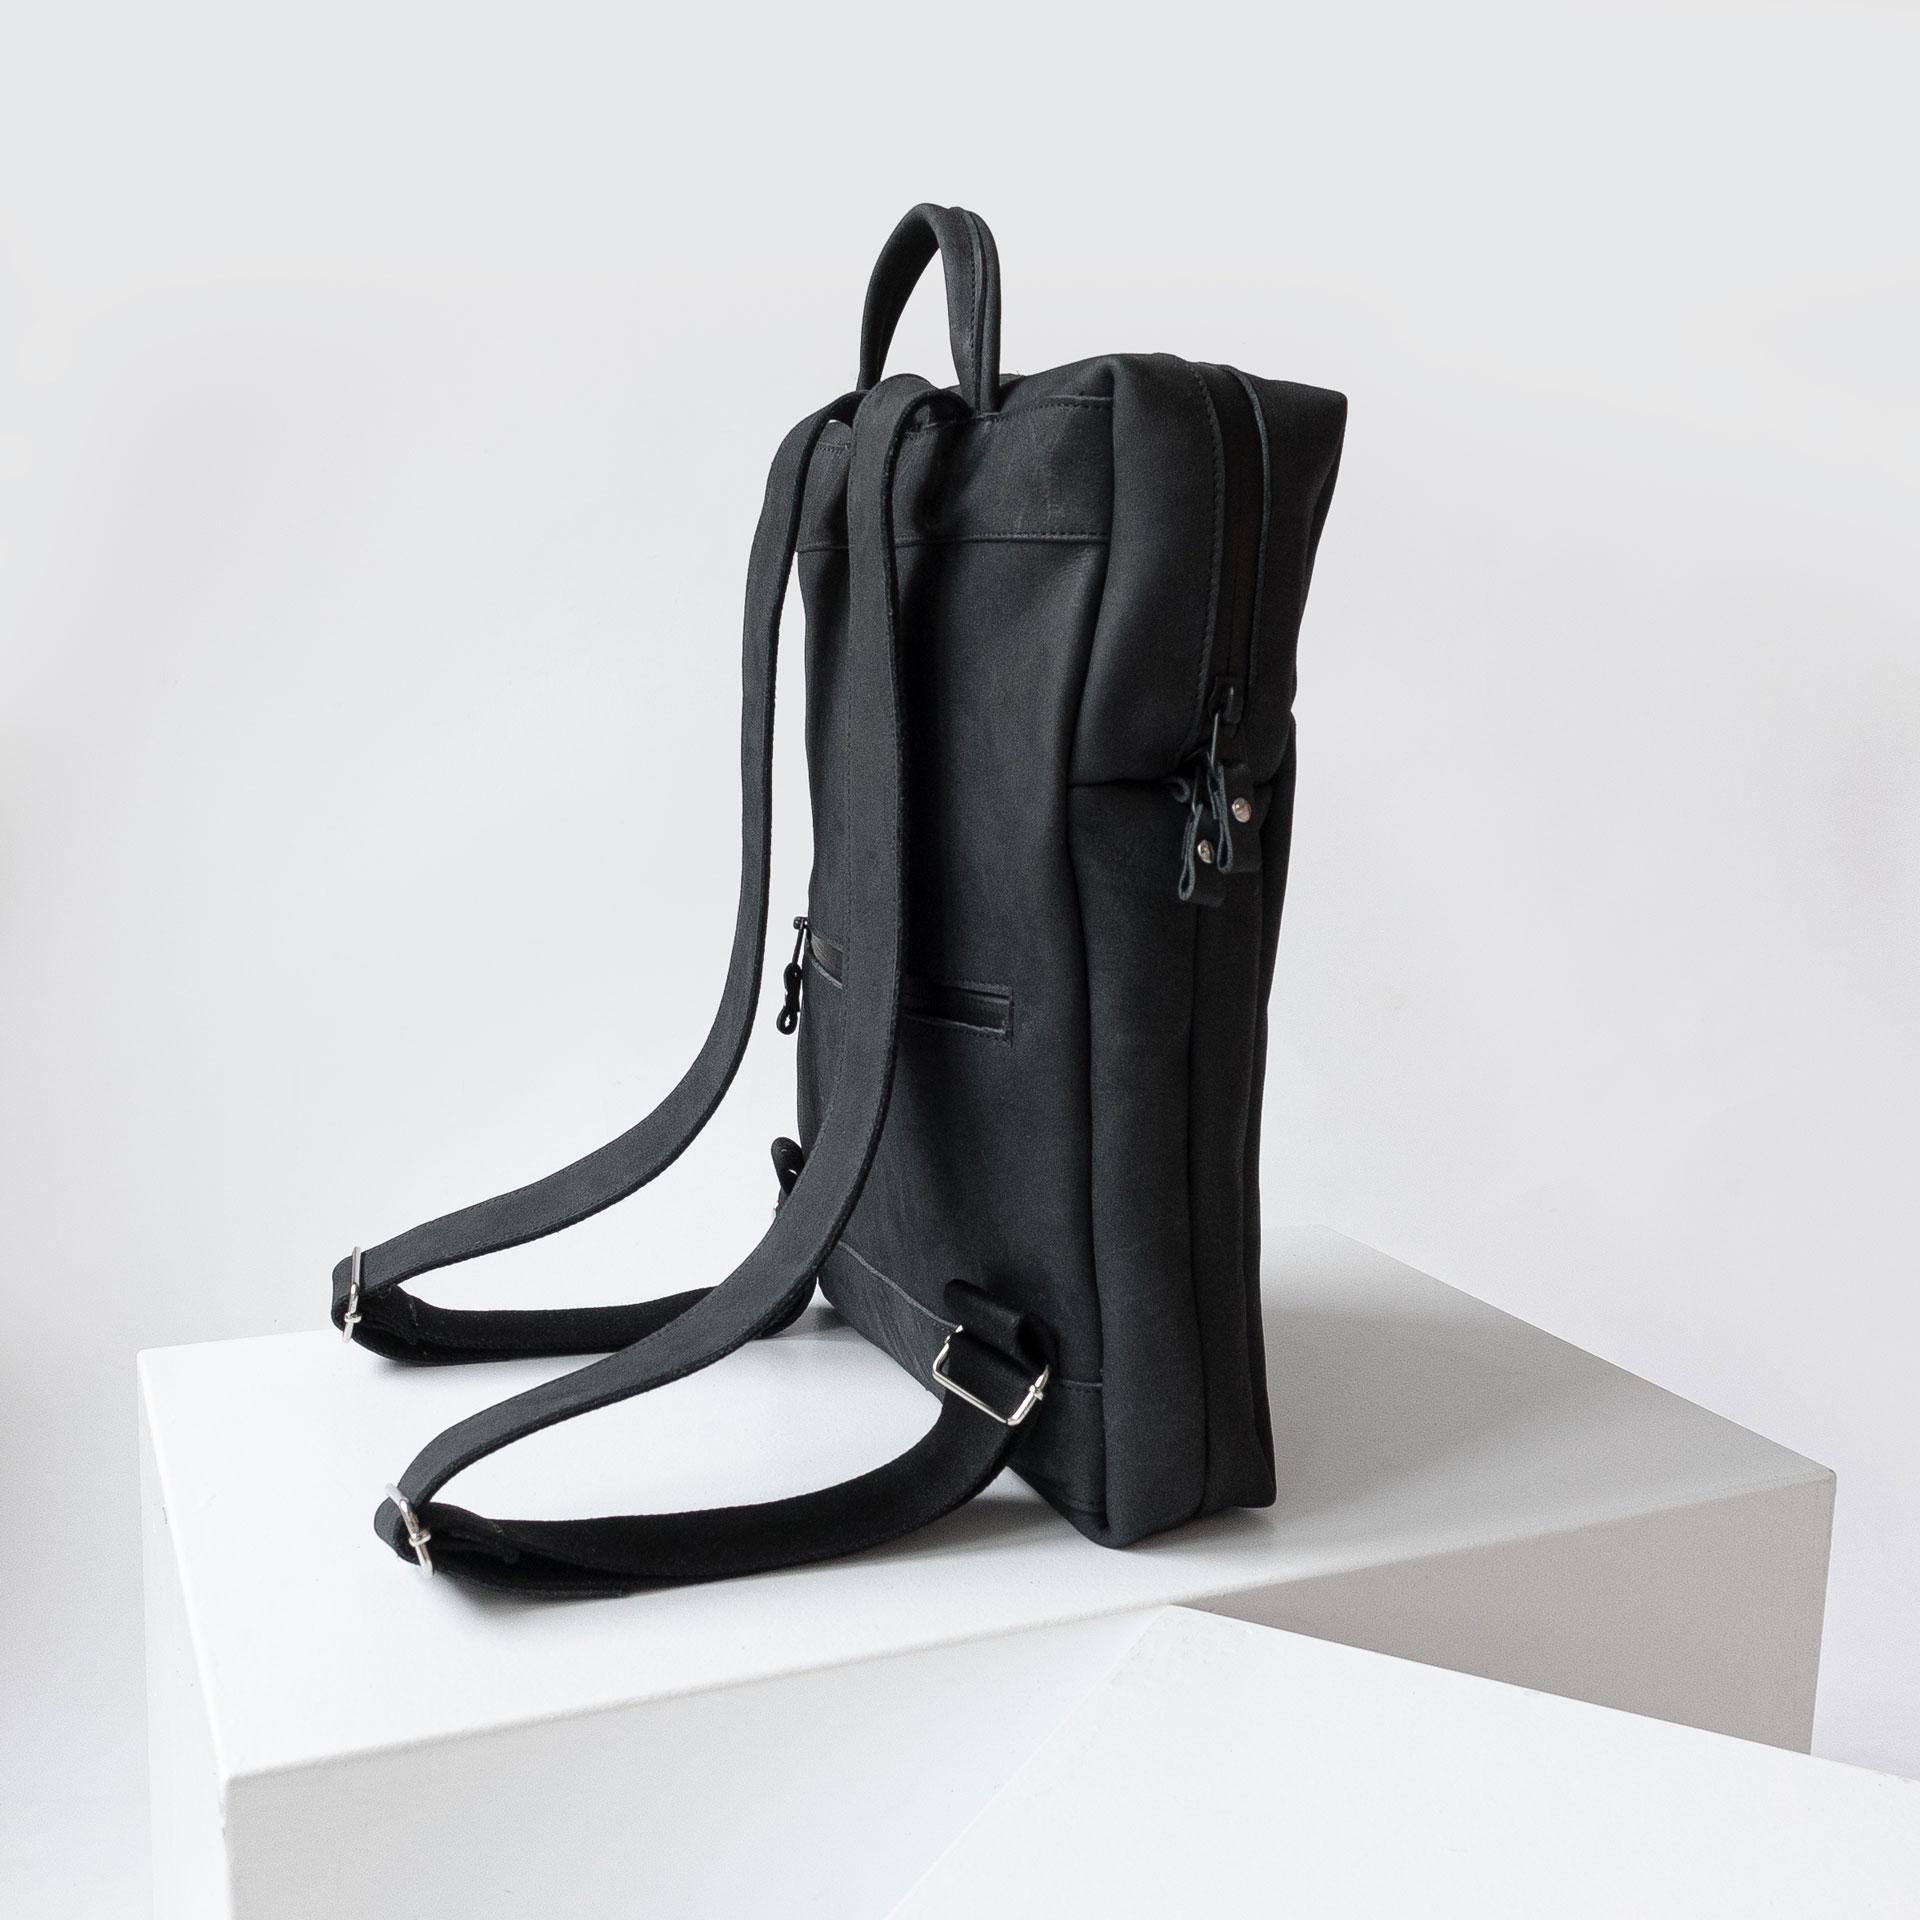 Rucksack-NEO-Small-Daypack-kohle-querseite